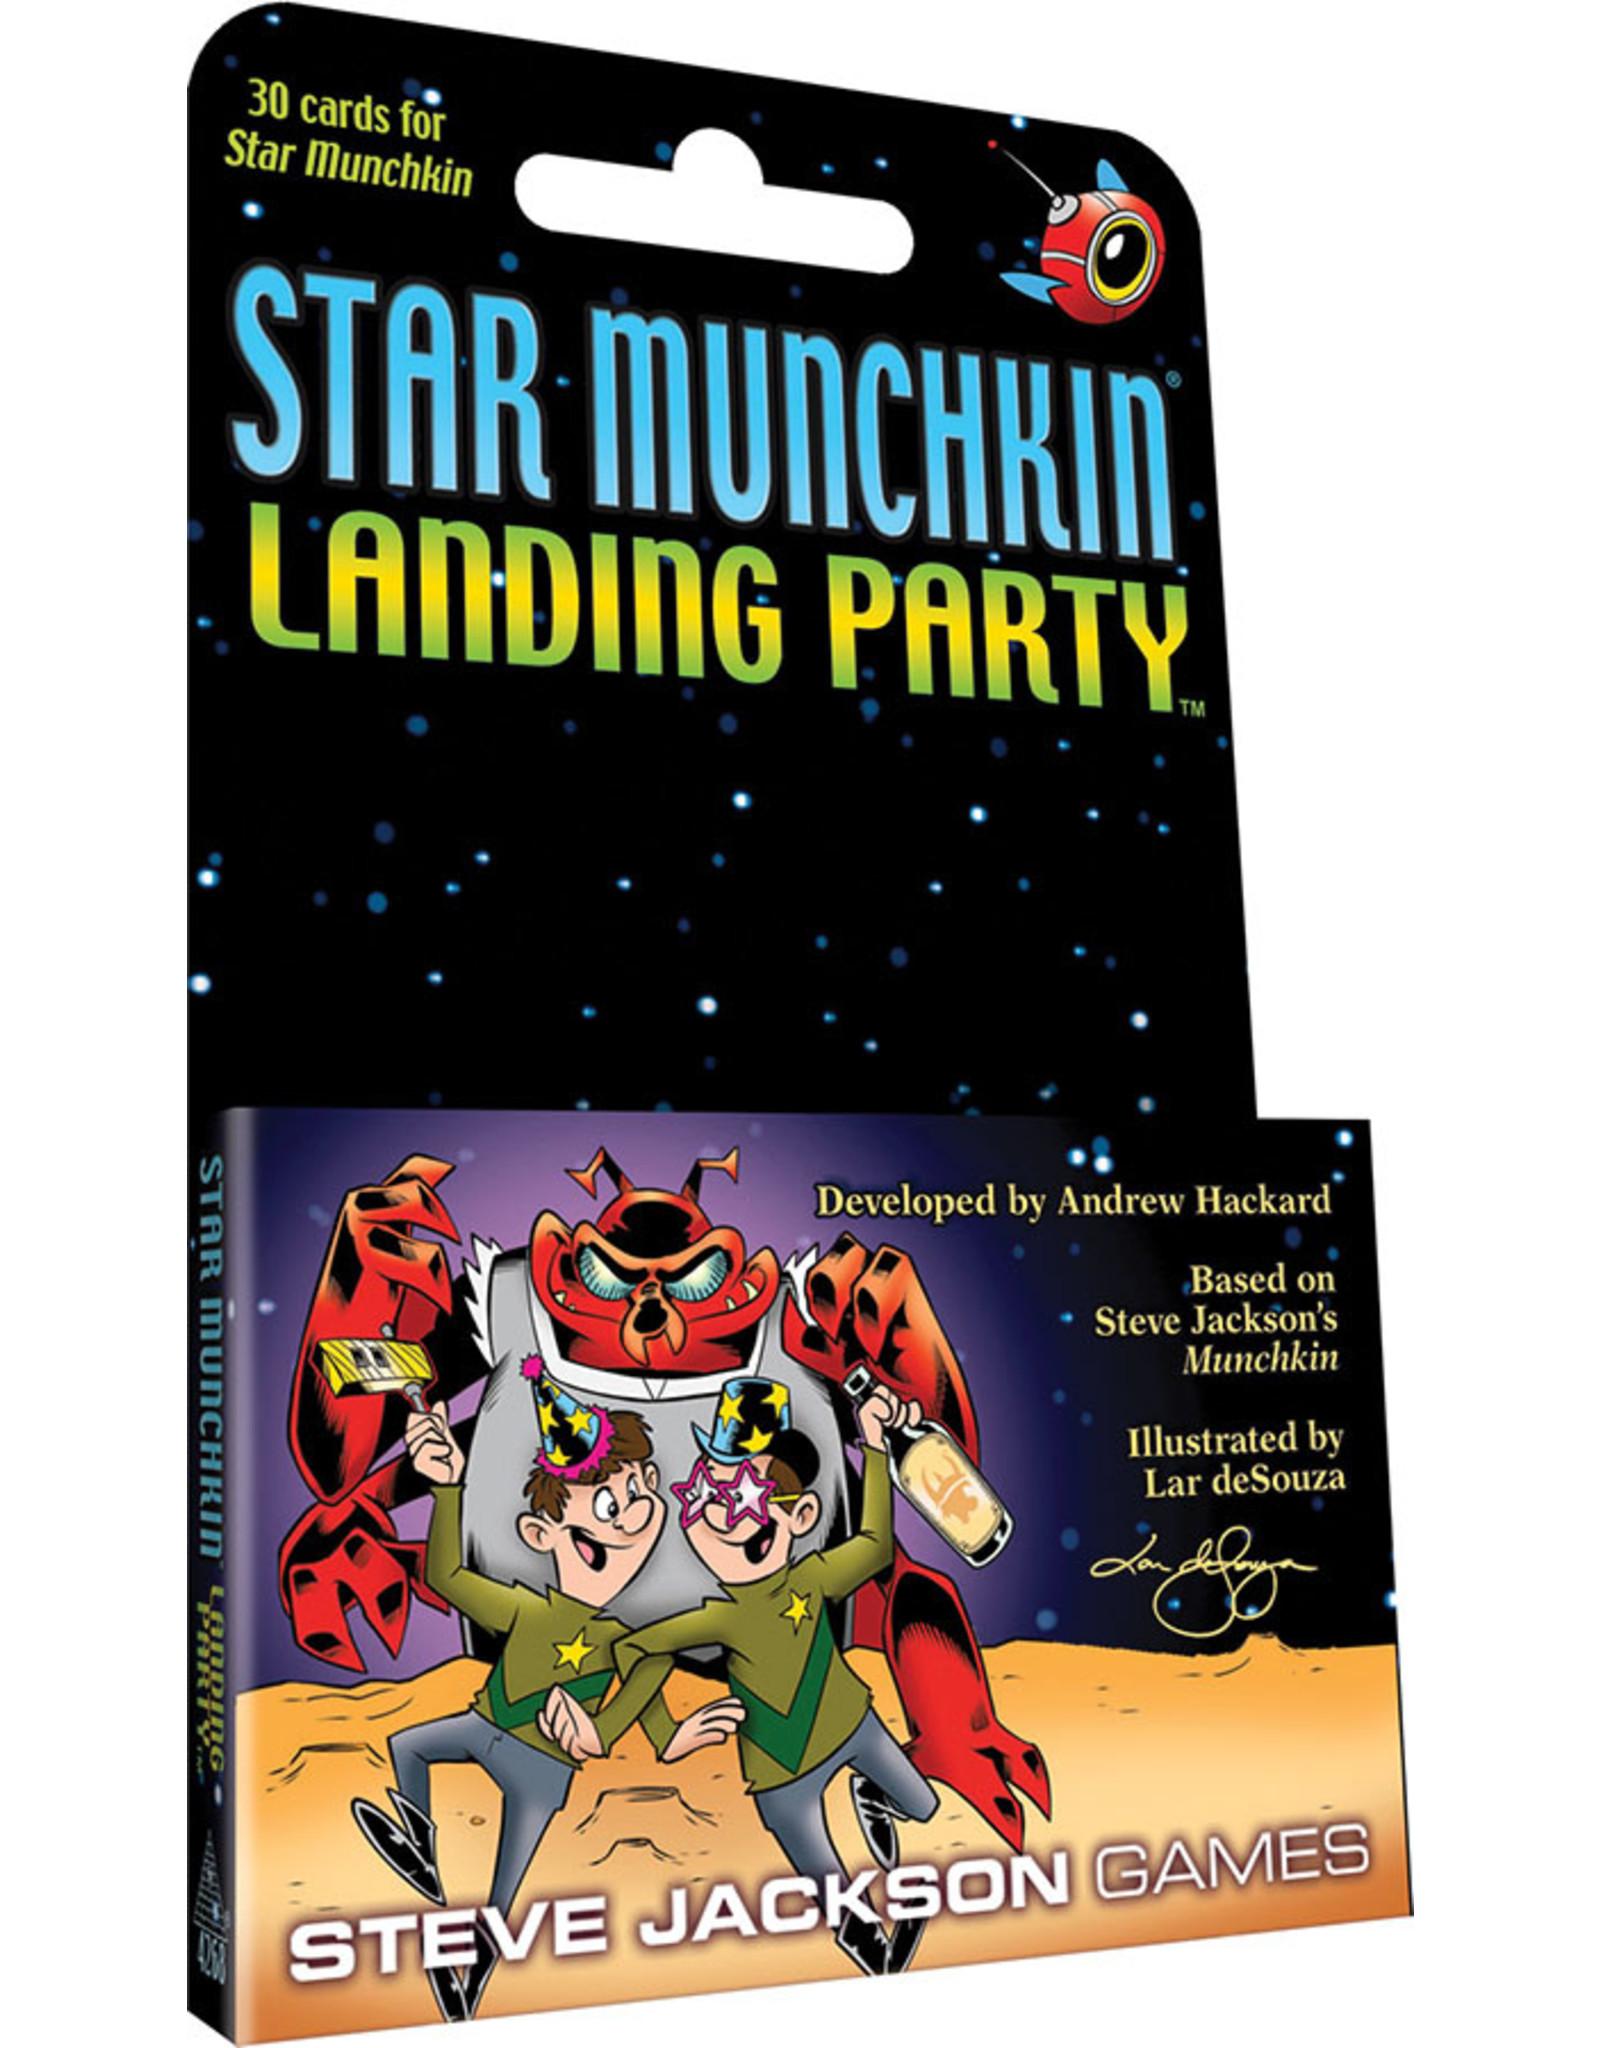 Steve Jackson Games Star Munchkin: Landing Party